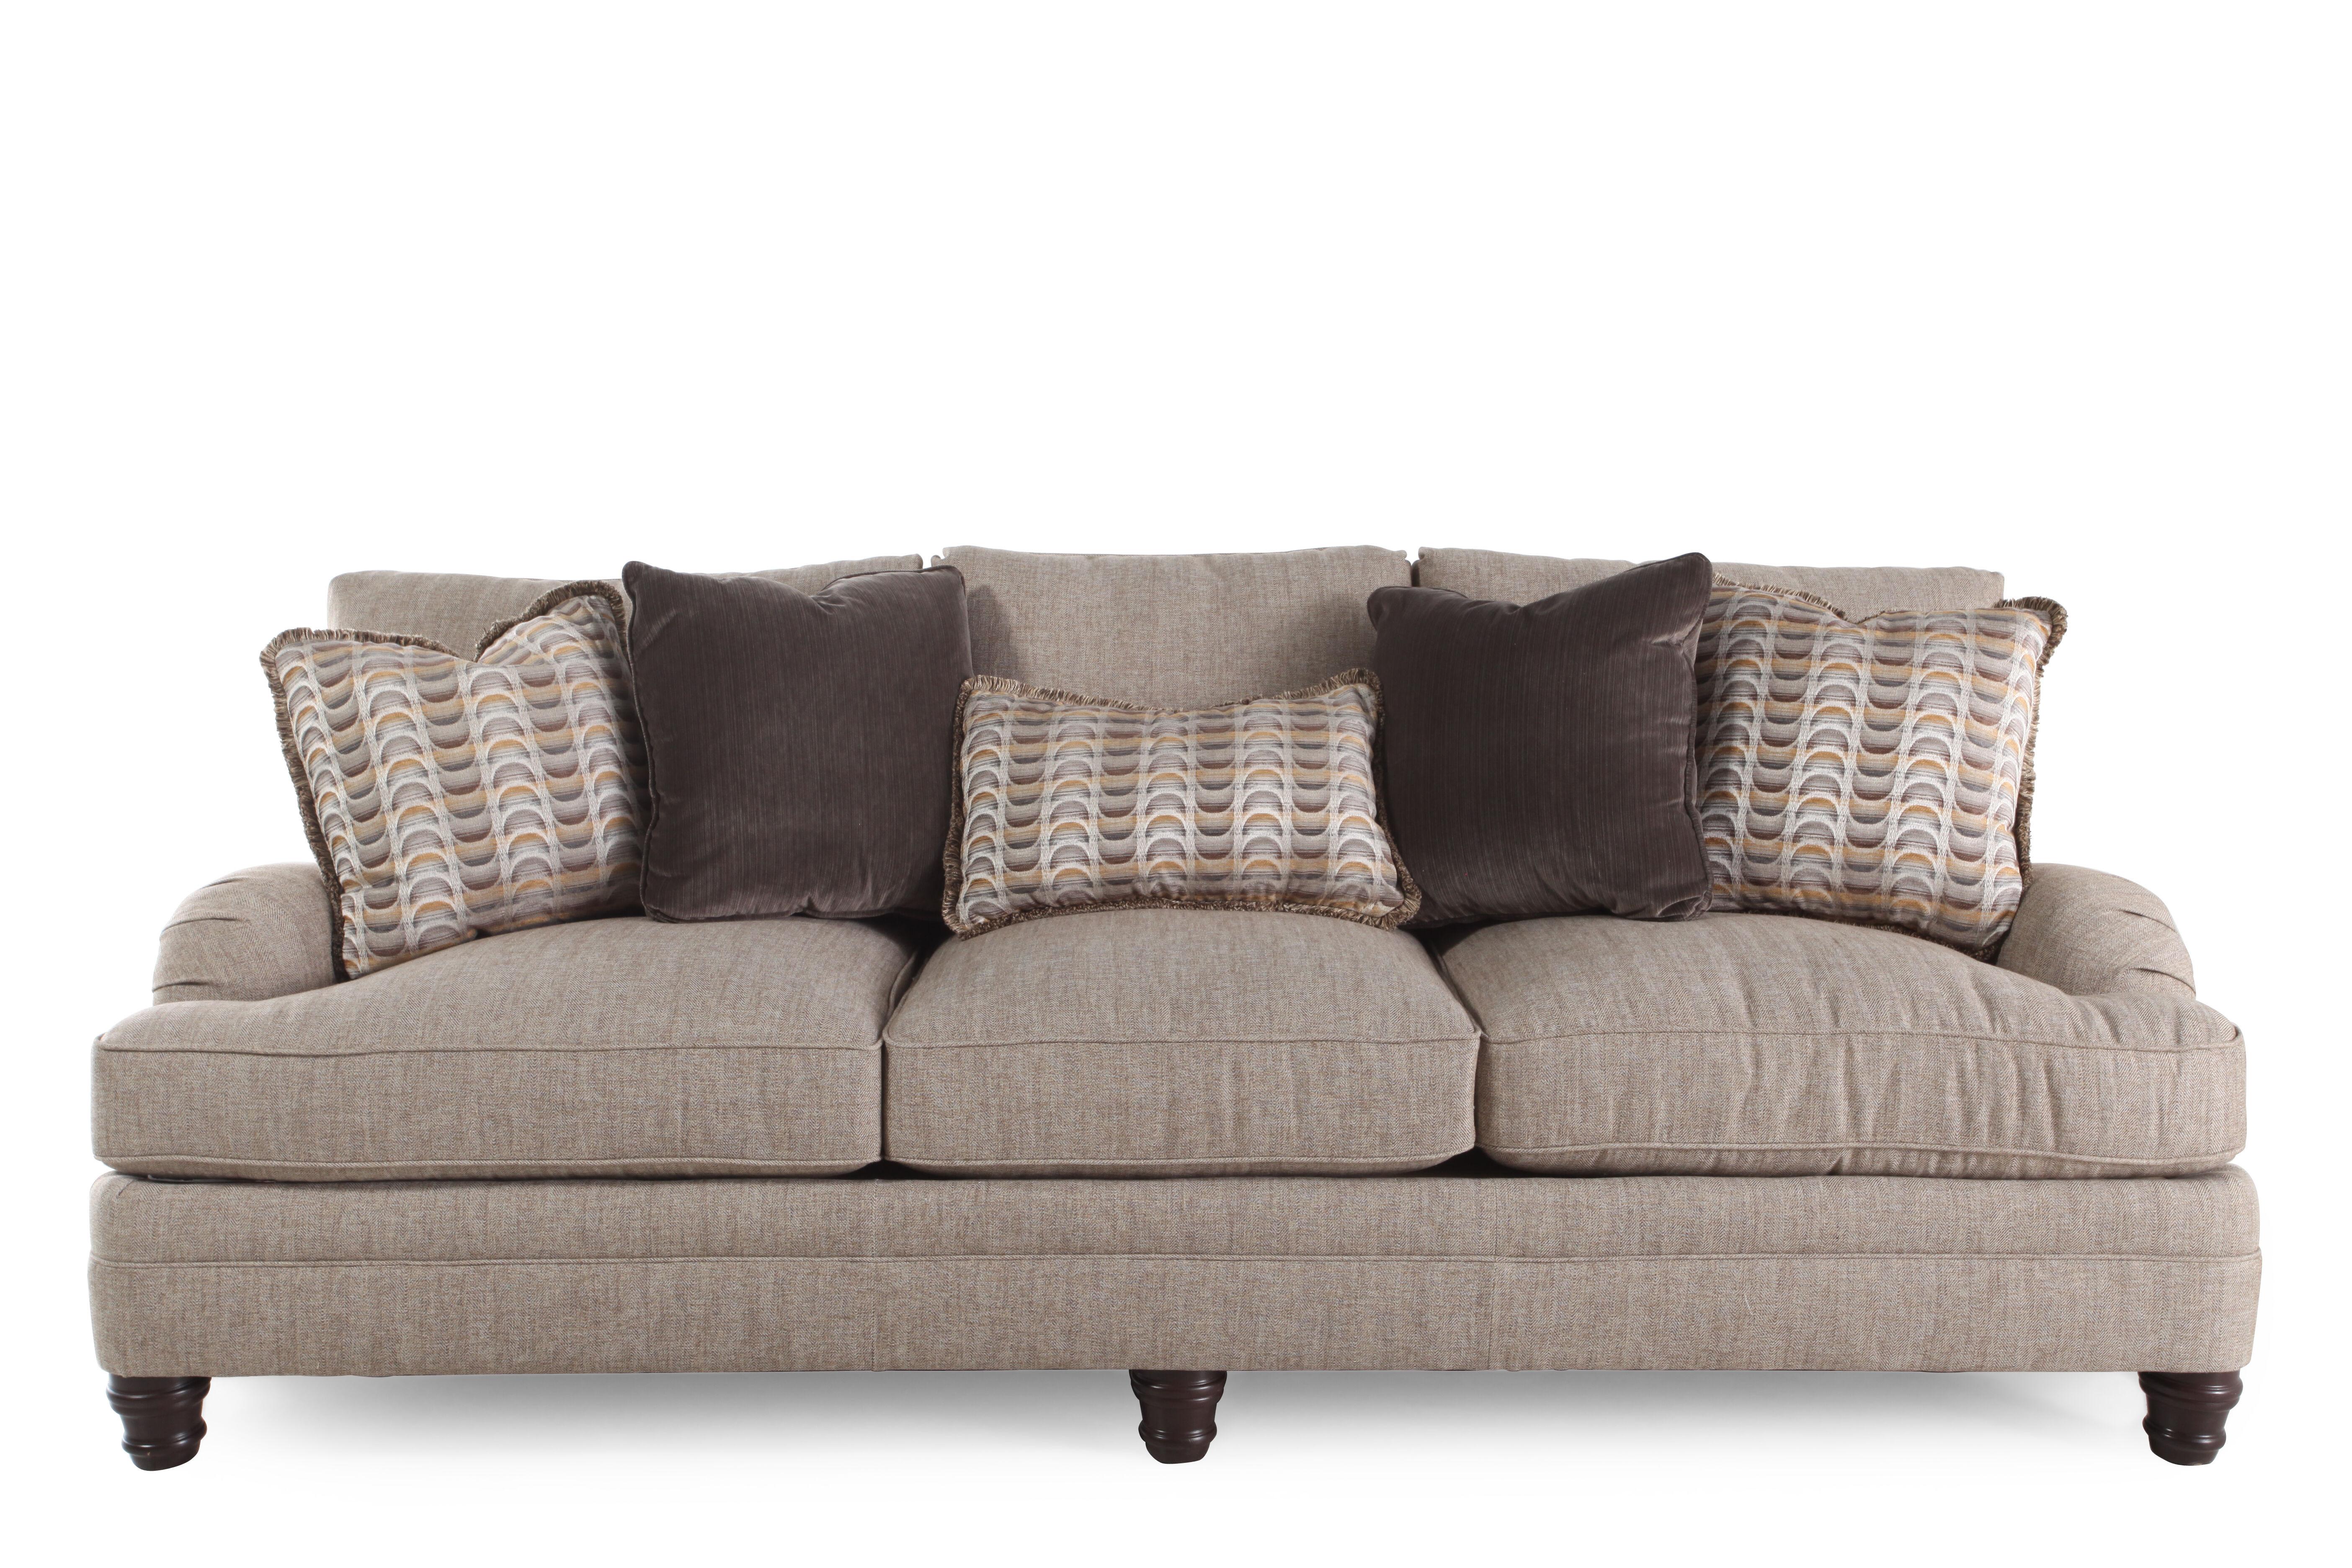 Superb European Classic 96.5u0026quot; Sofa In Sandy Brown